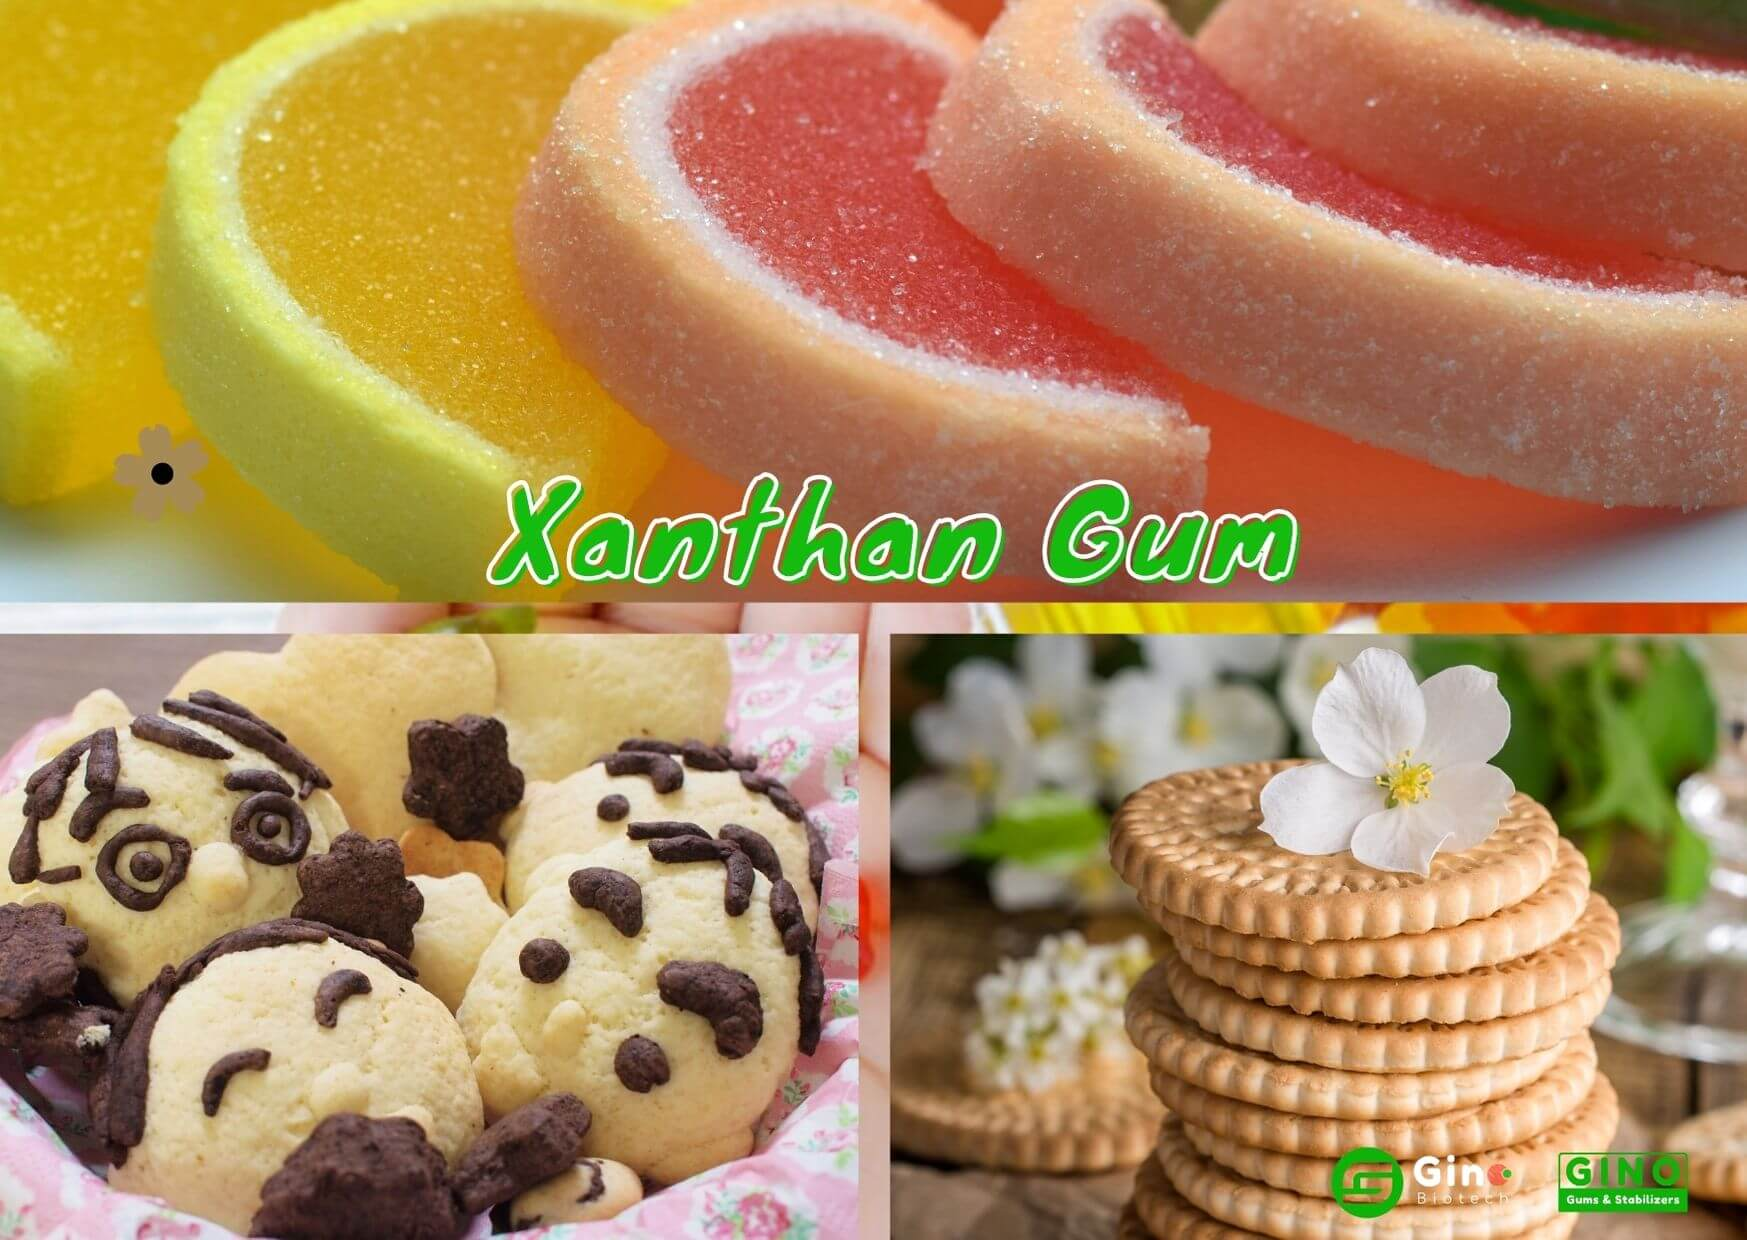 xanthan gum uses